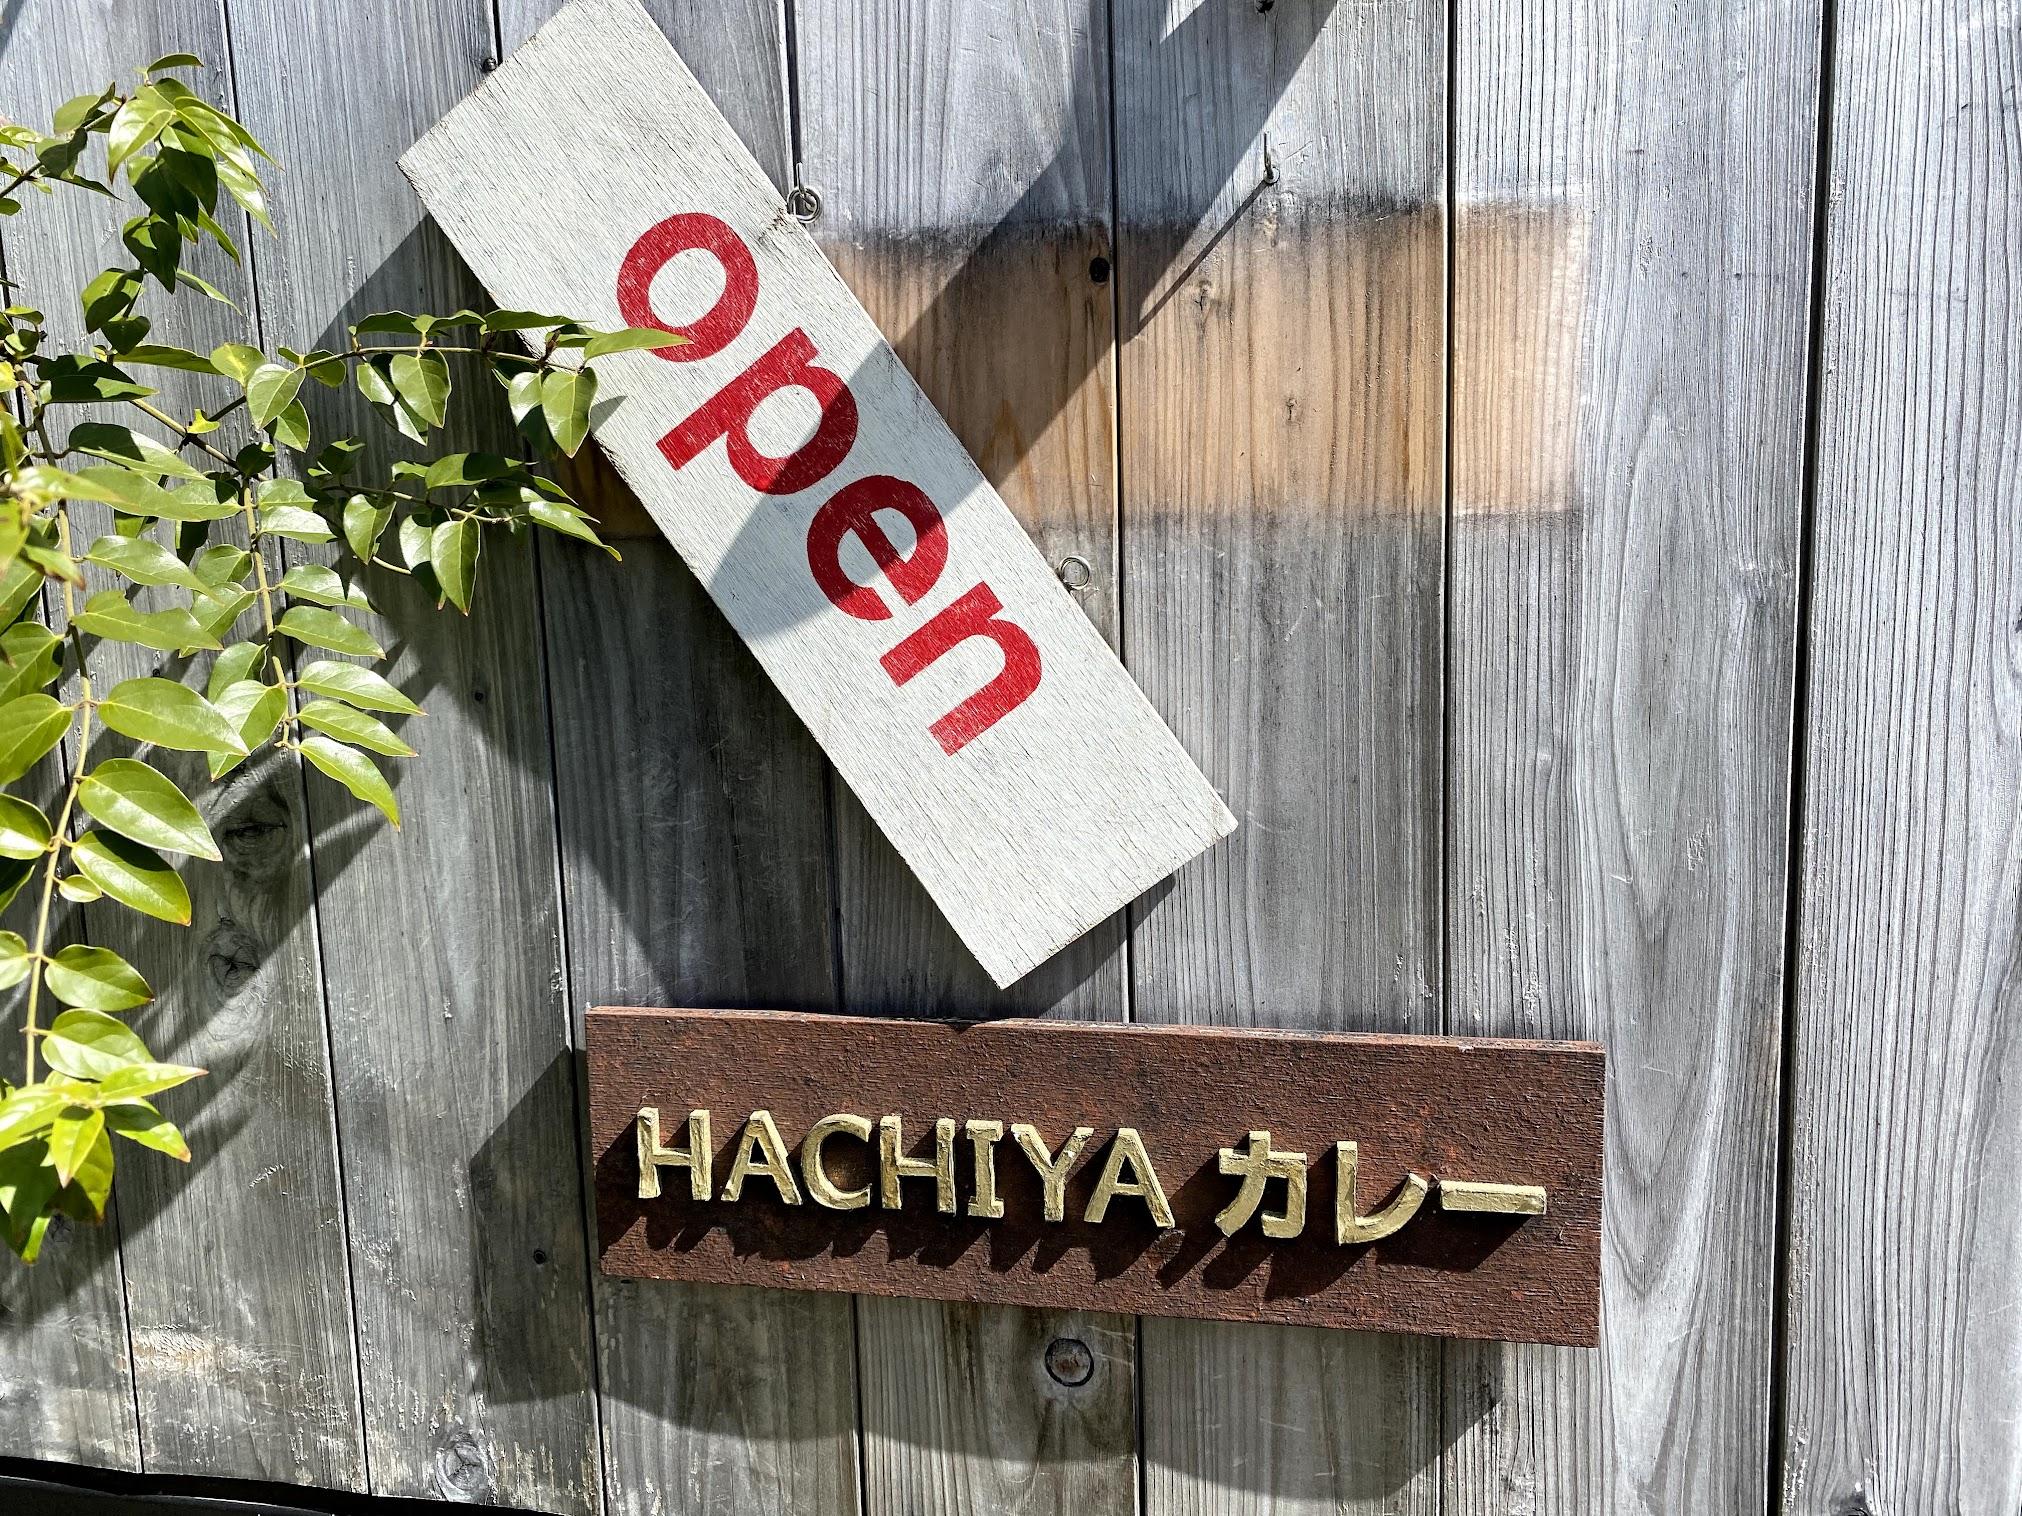 HACHIYAカレーopen